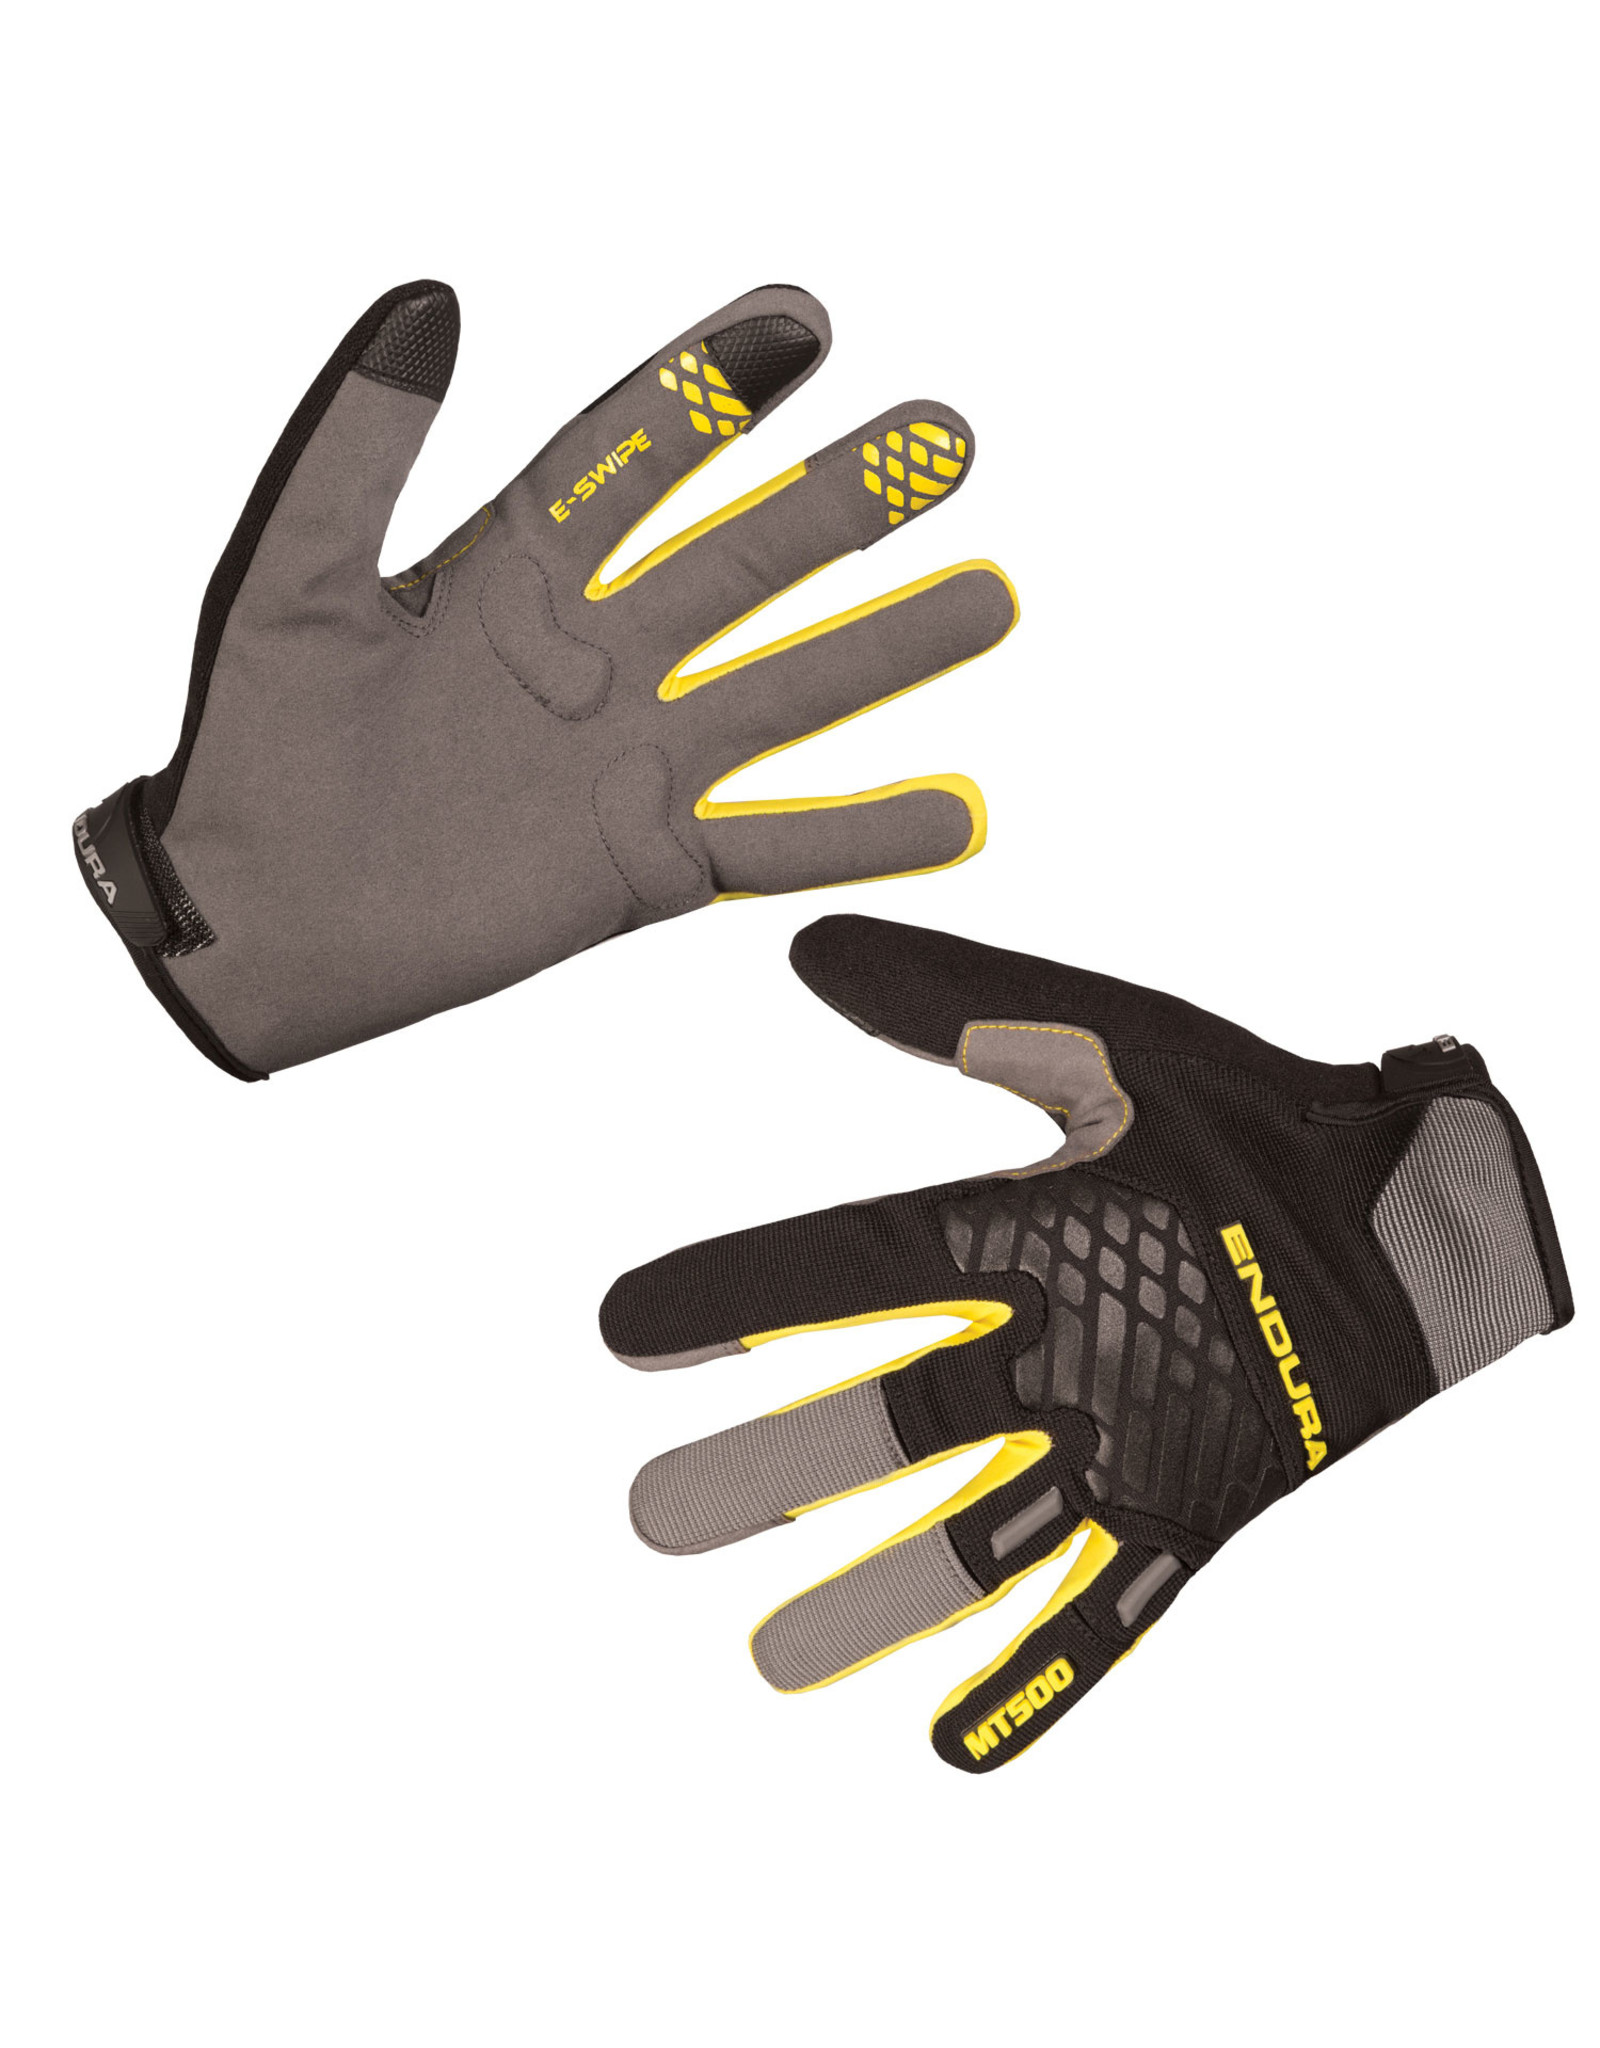 Endura Endura MT500 Glove II, MB: M